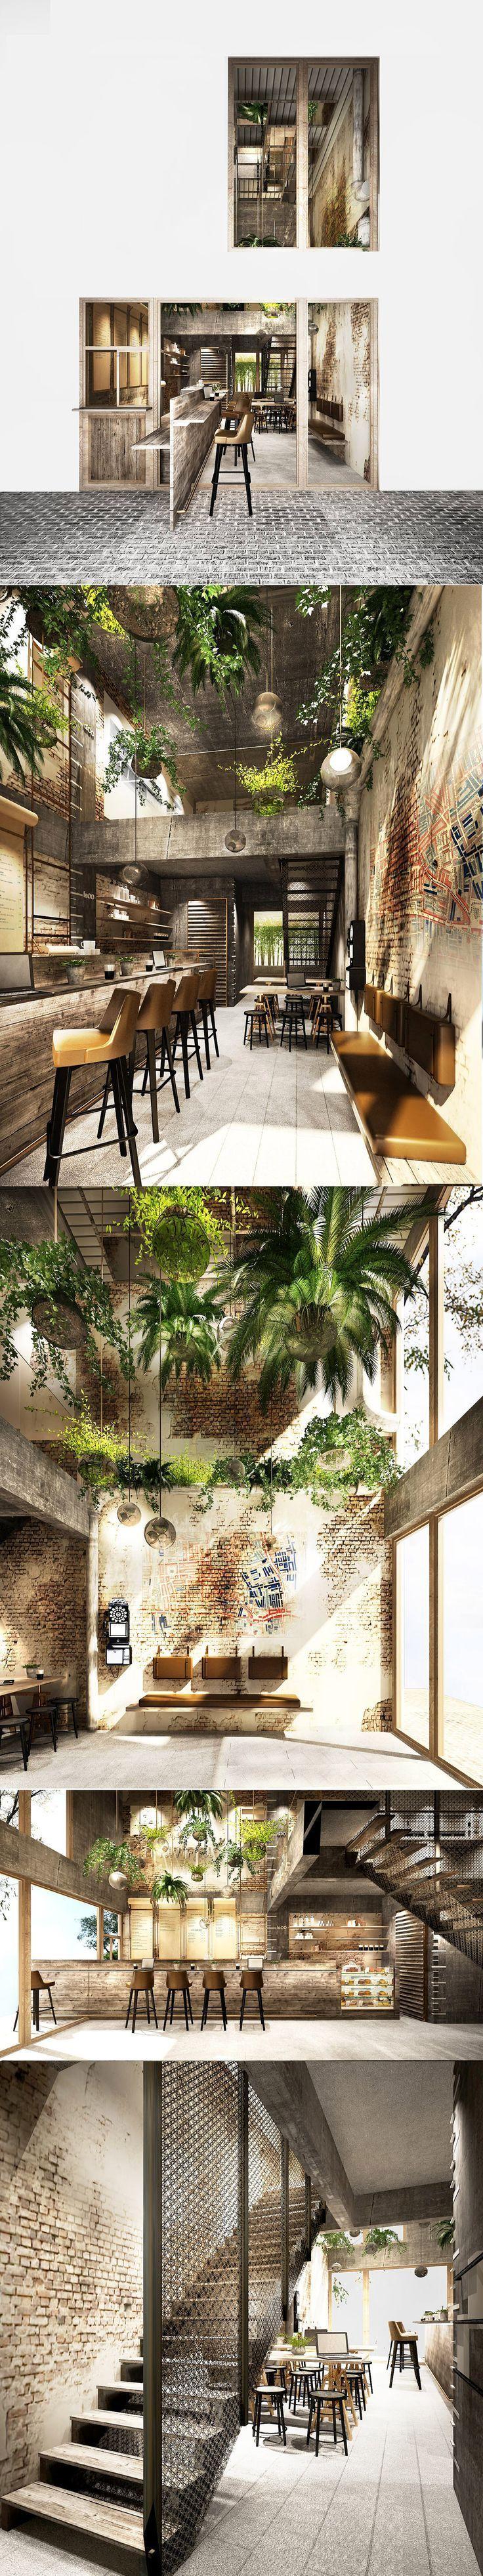 54 best Restaurant design images on Pinterest   Restaurants, Cafe ...